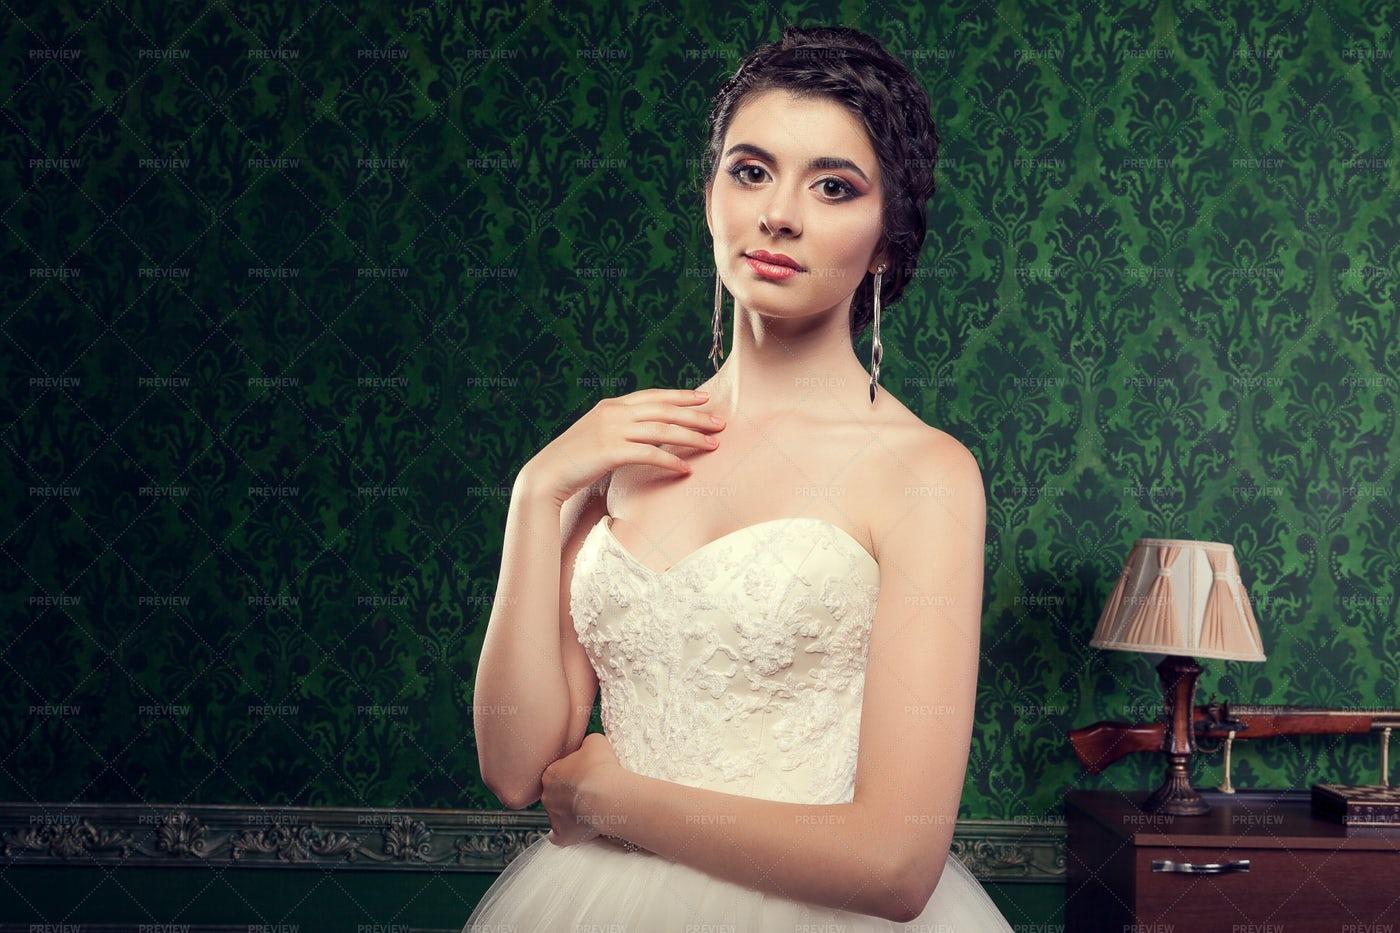 Bride In Strapless Dress: Stock Photos